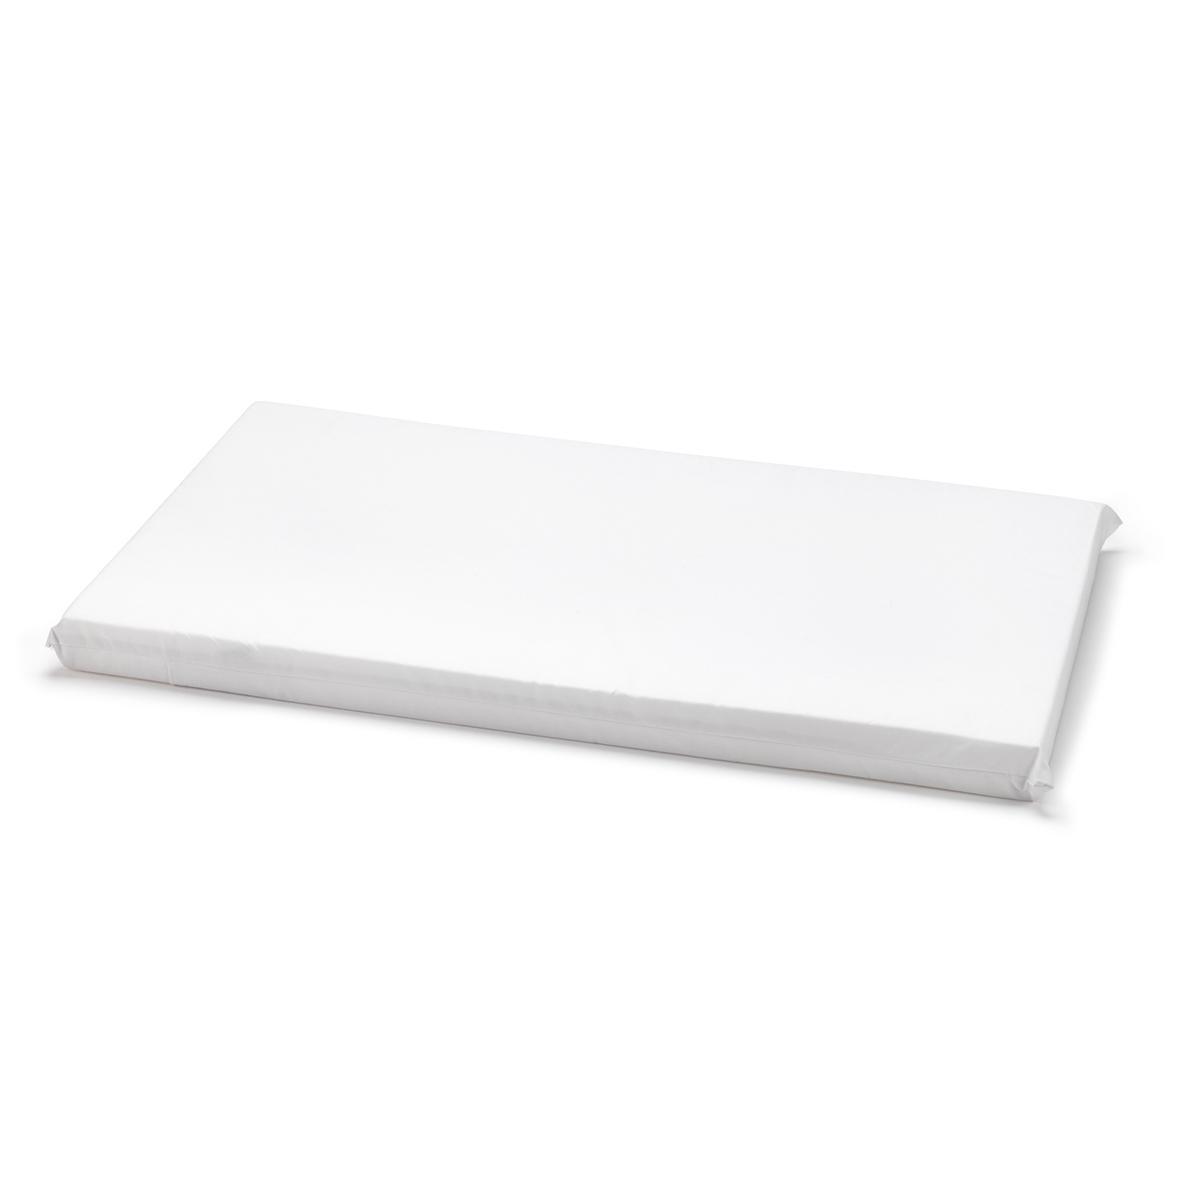 Colchon Minicuna Liso E 46.5x81x5 CM Blanco